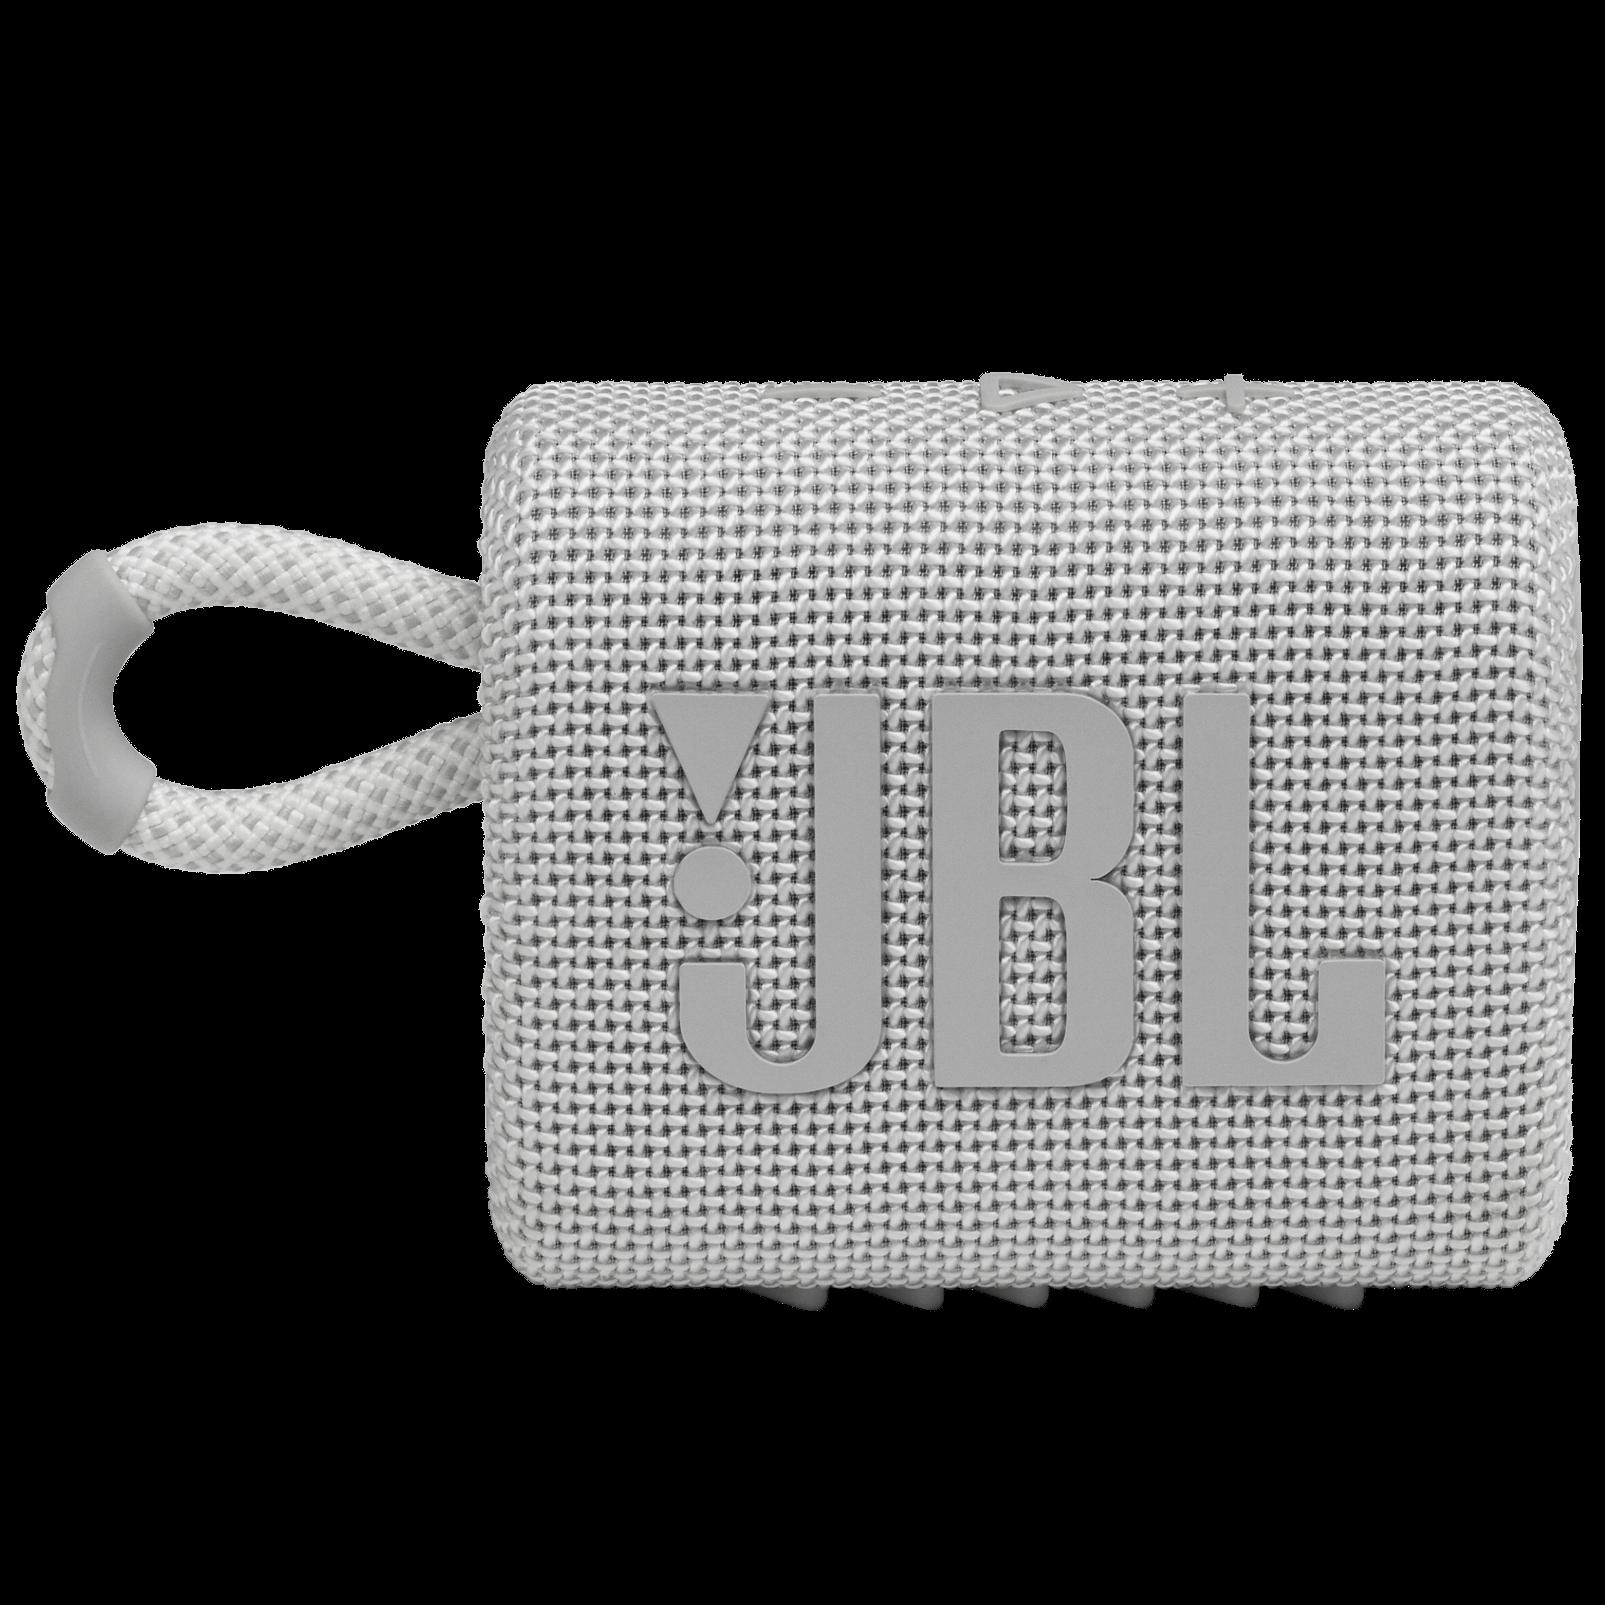 JBL GO 3 - White - Portable Waterproof Speaker - Front